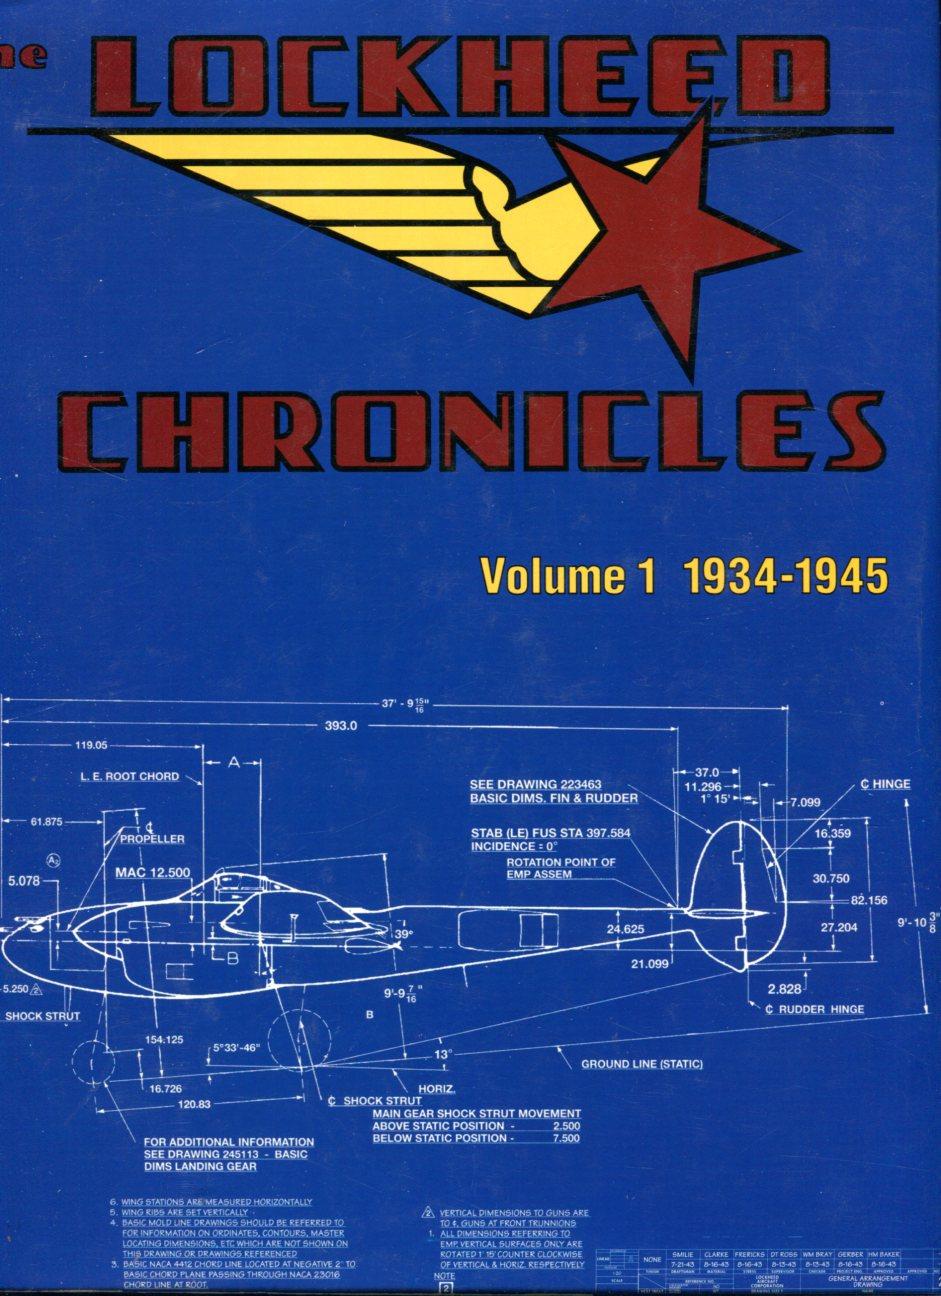 The Lockheed Chronicles, Volume 1 1934-1945